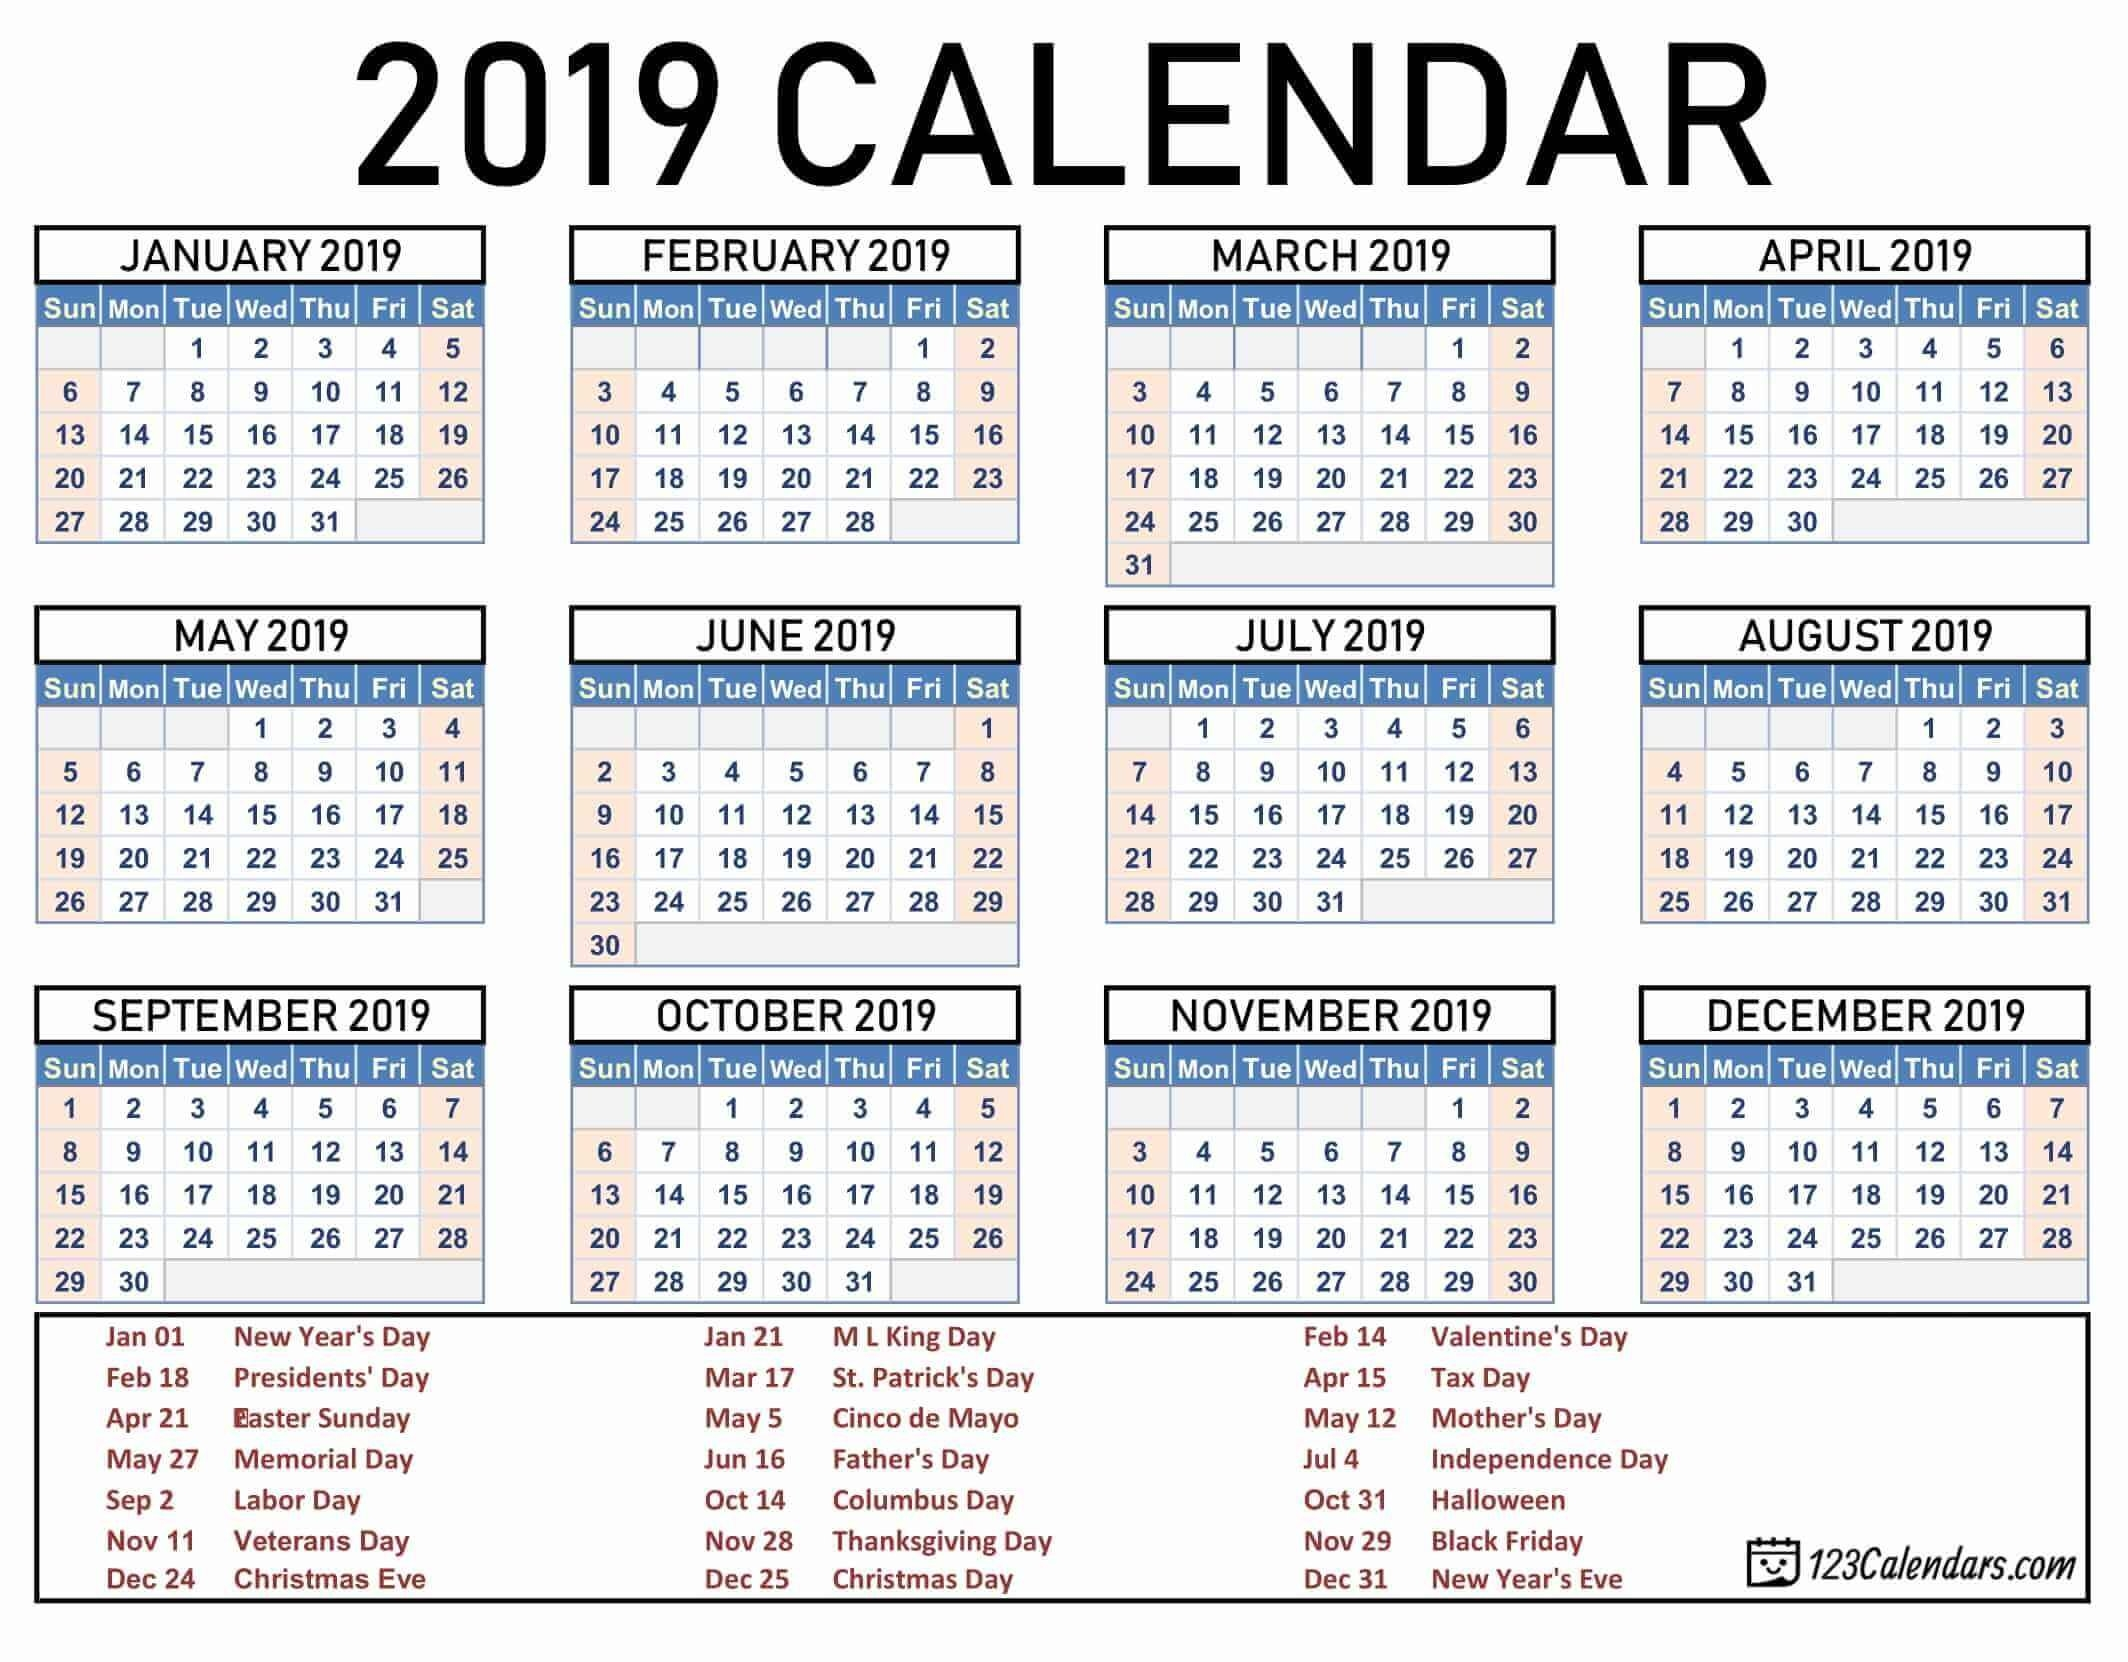 Year 2019 Printable Calendar Templates – 123Calendars Calendar 4 2019